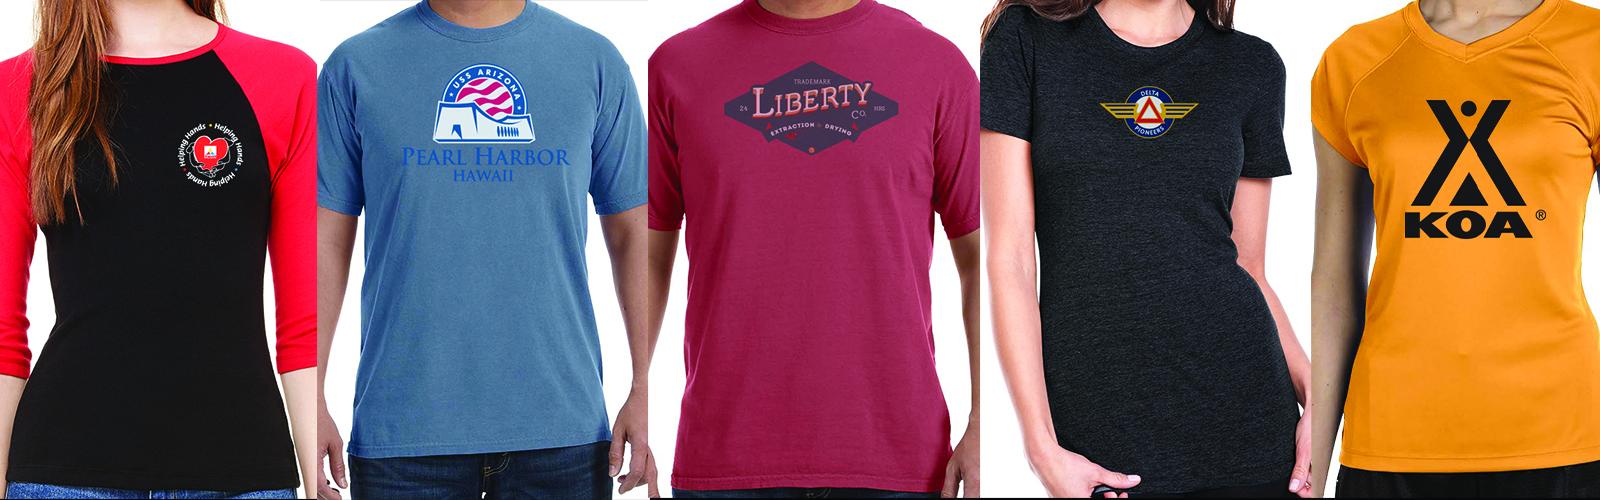 Logo T Shirts Sweatshirts Jackets And More Best Heat